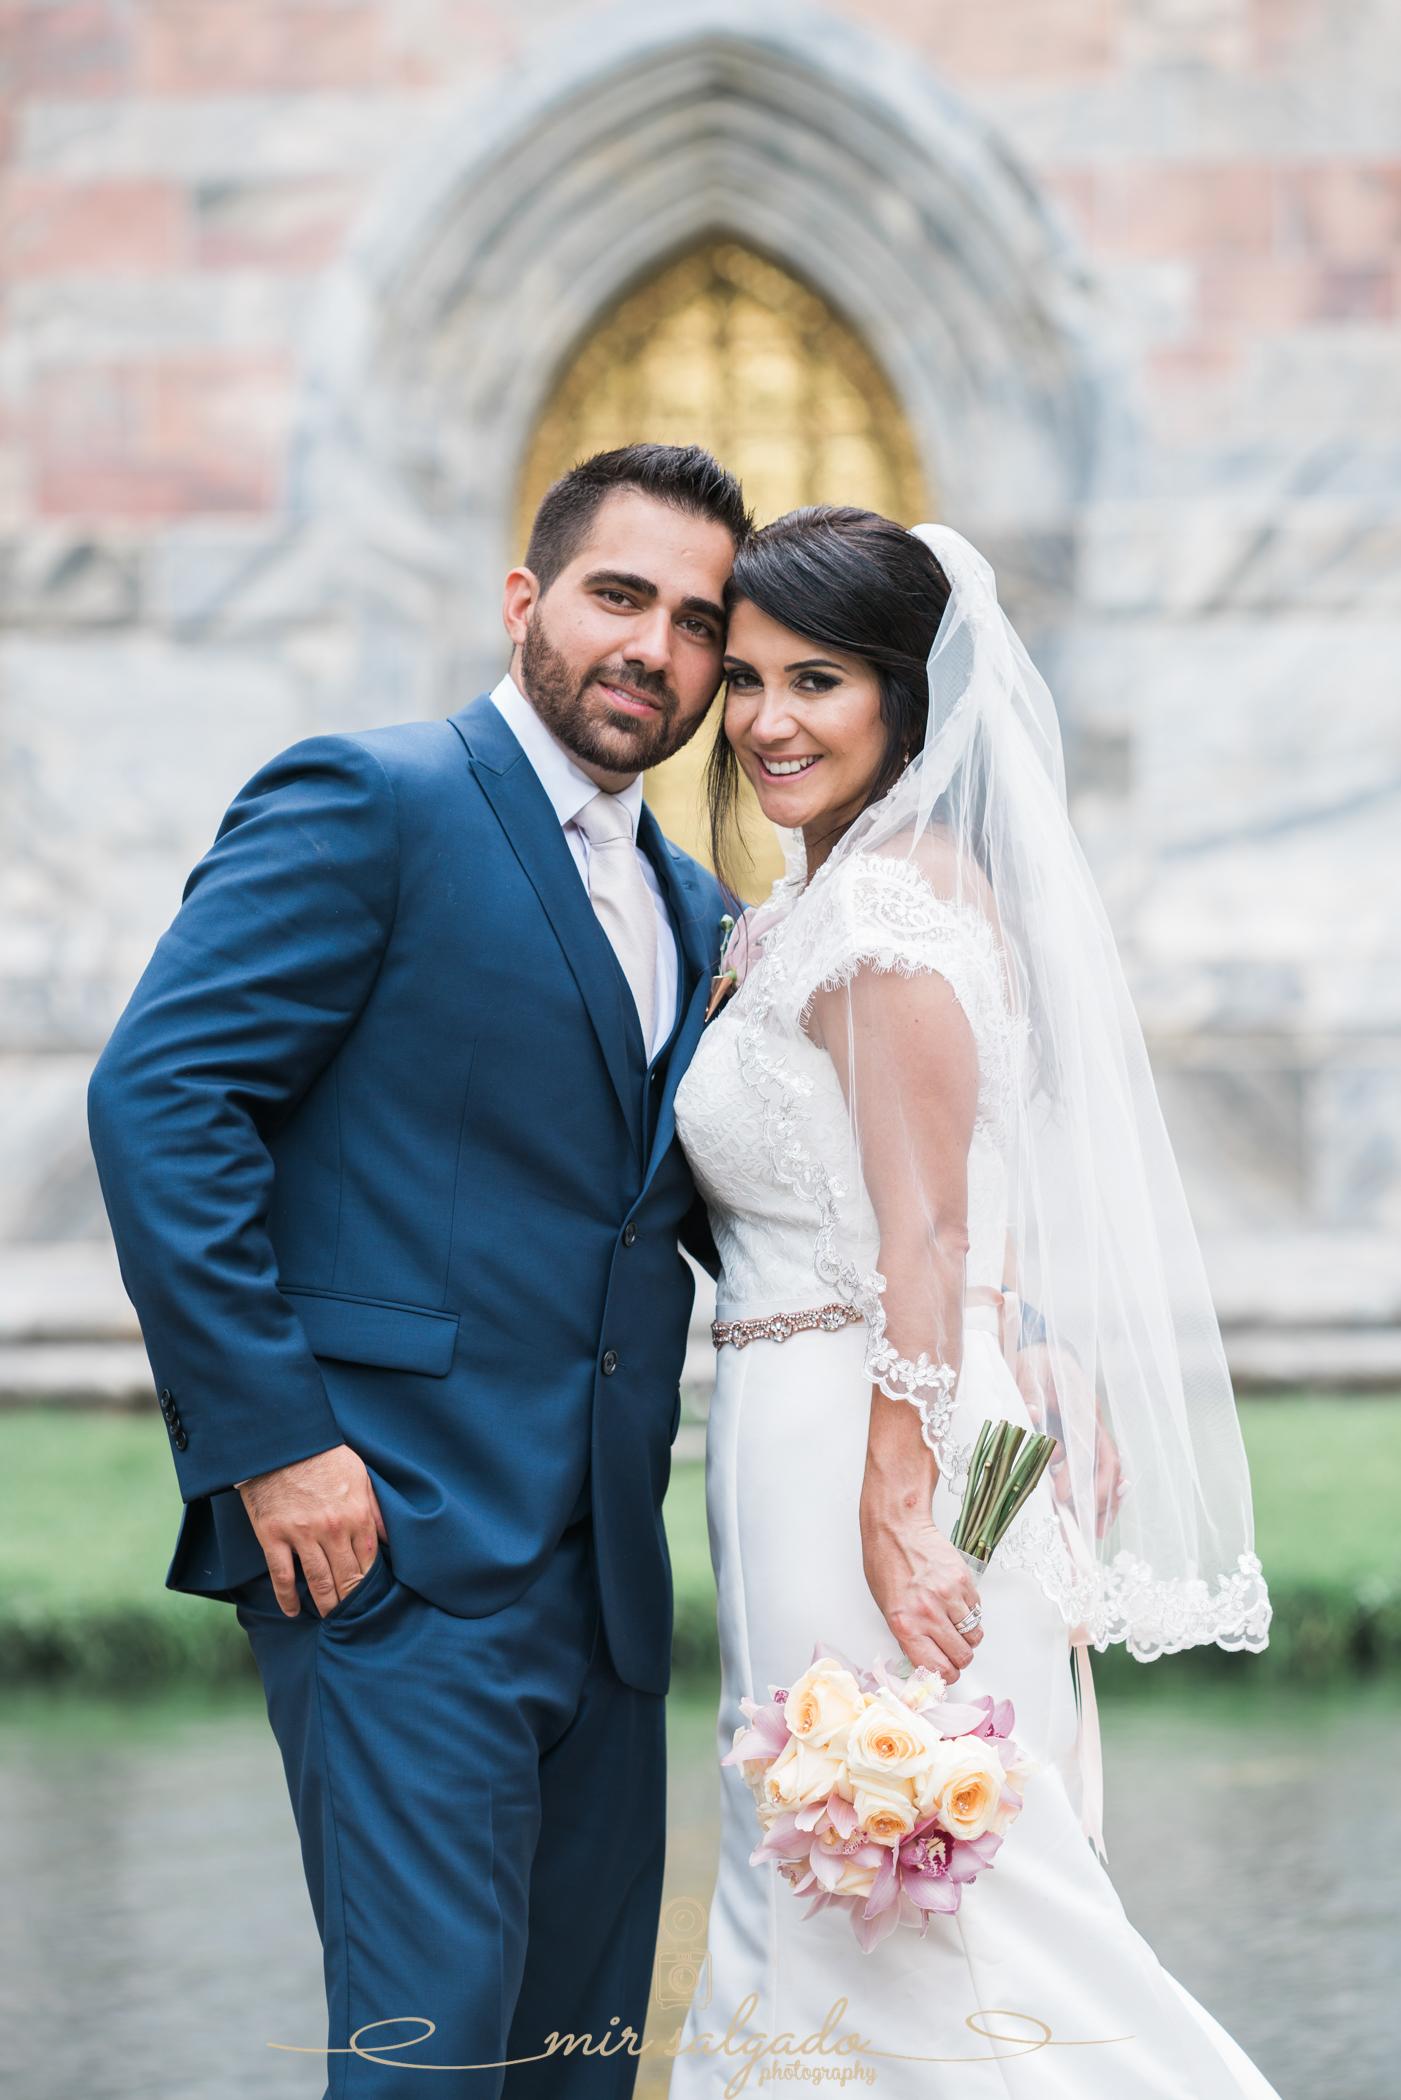 Bok-tower-gardens-wedding-photography, Tampa-wedding-photography